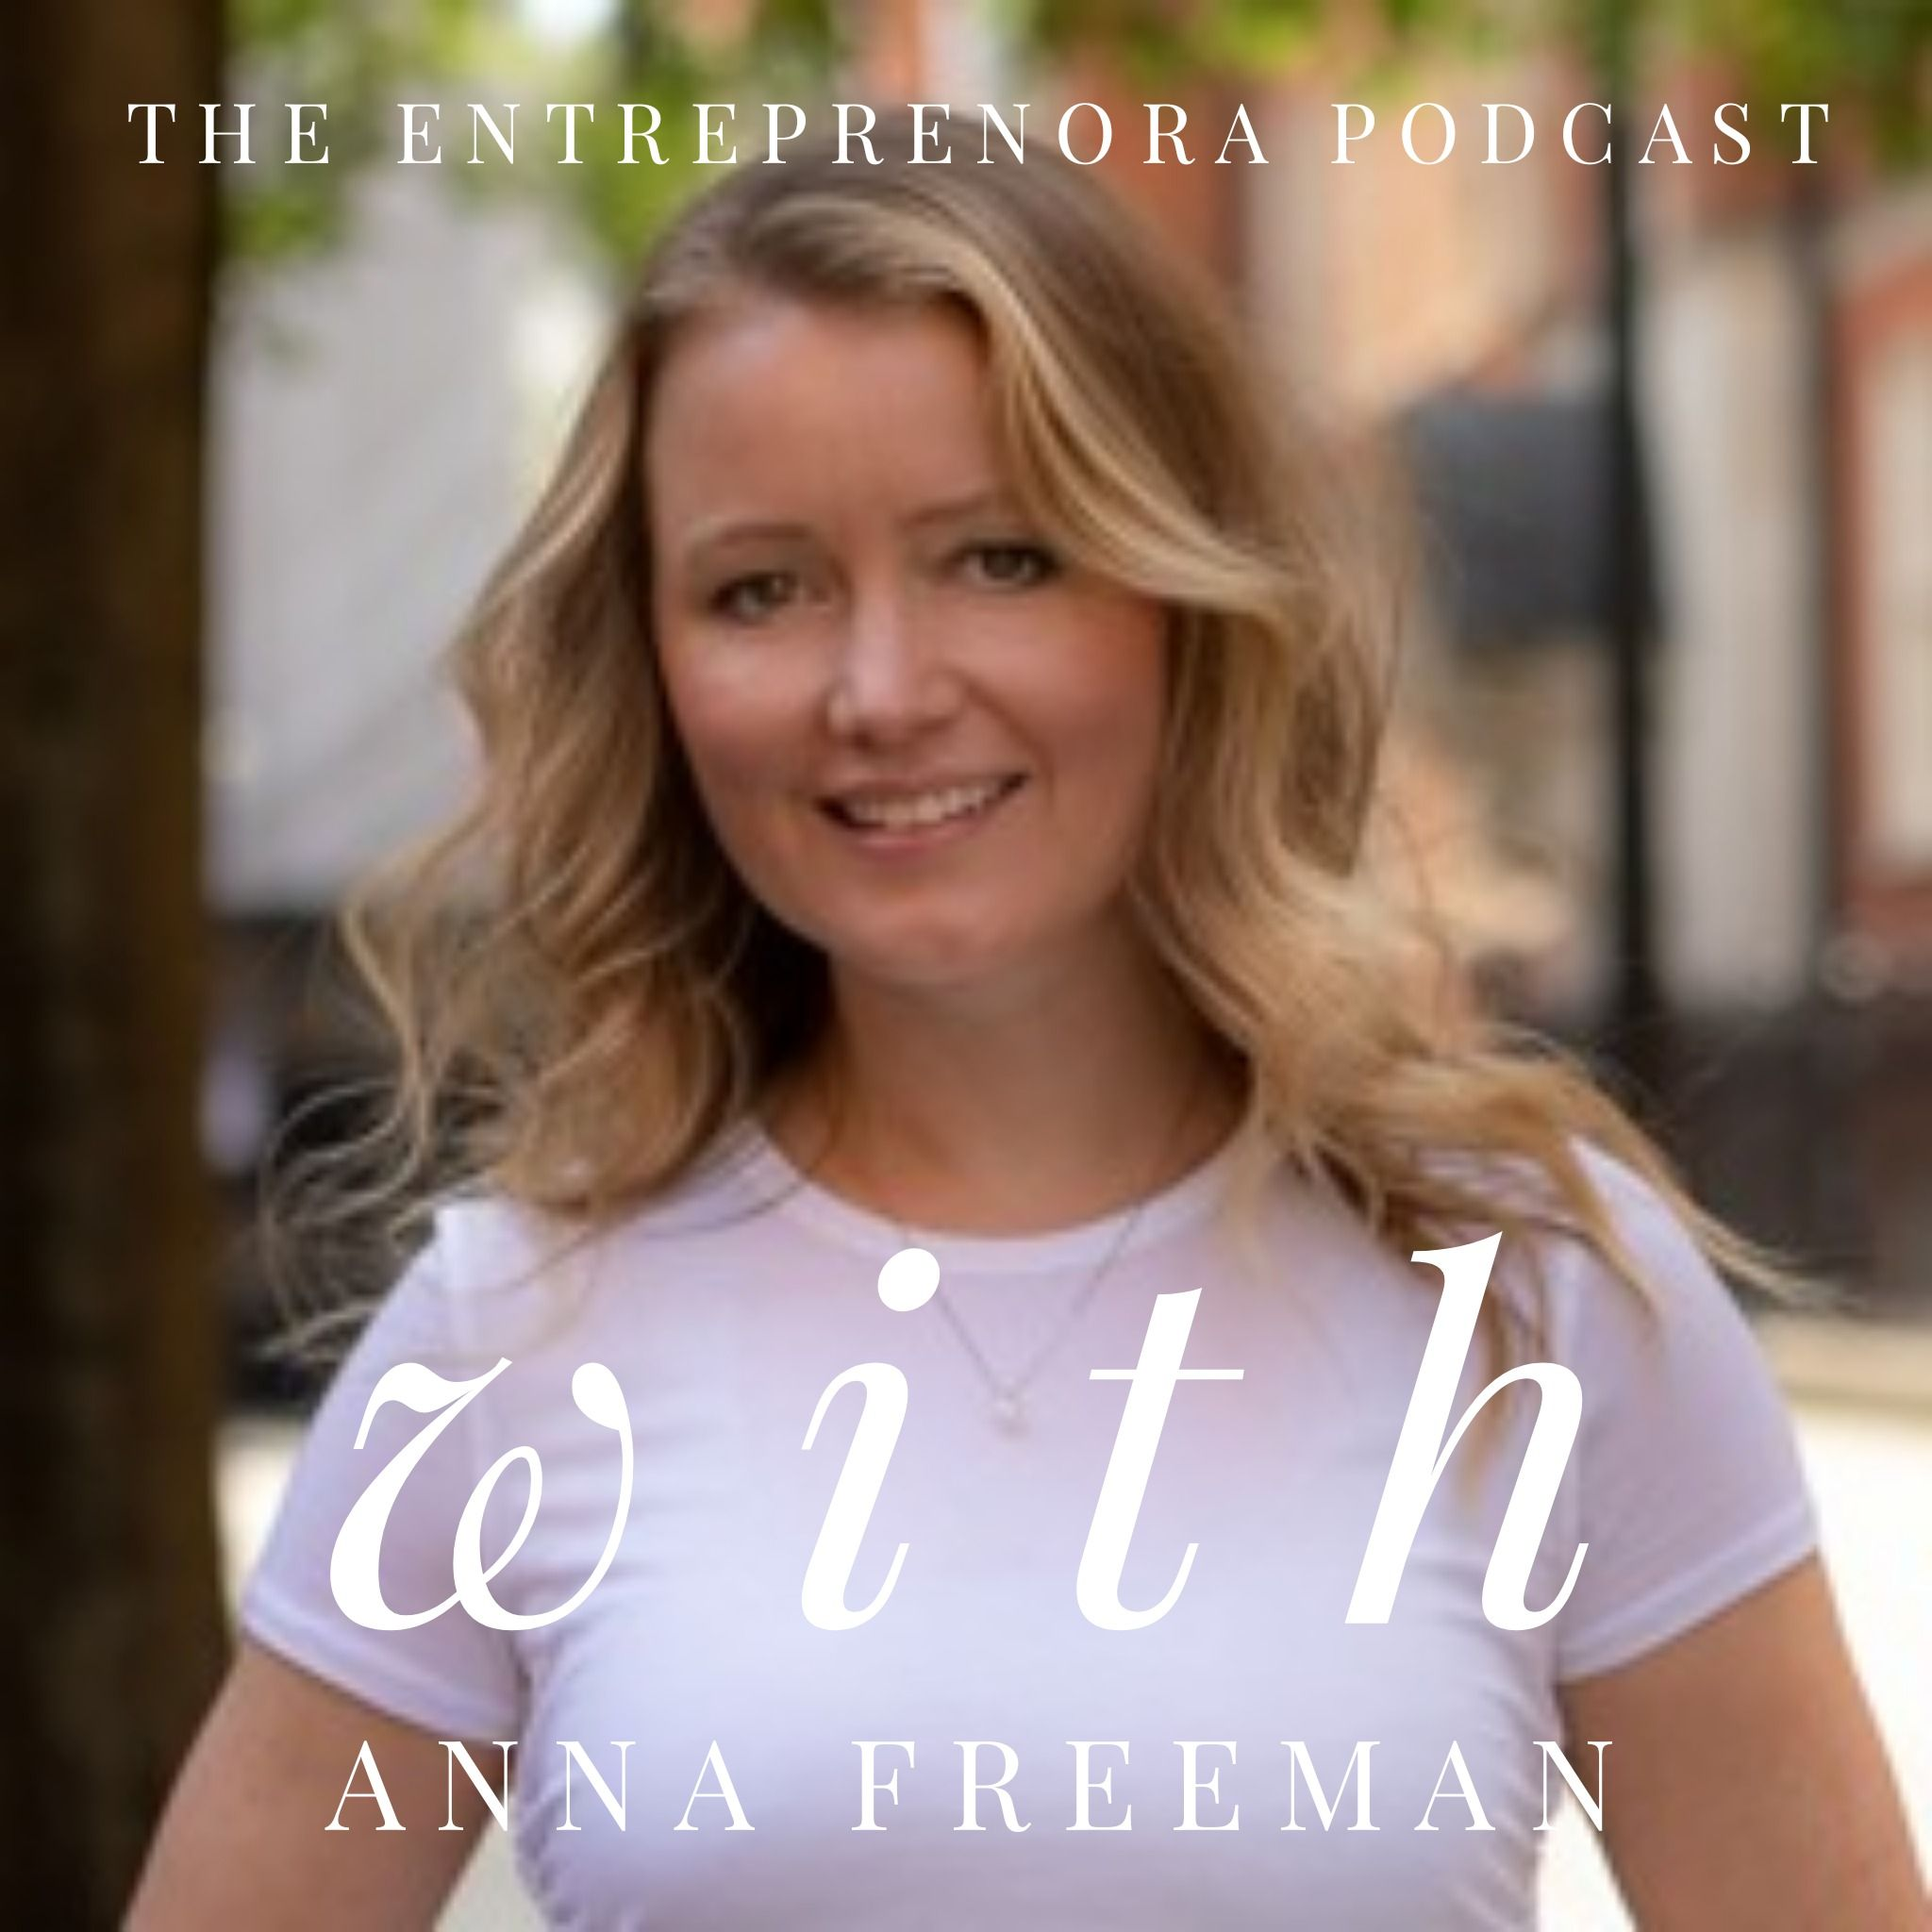 with Anna Freeman, founder of ZavFit